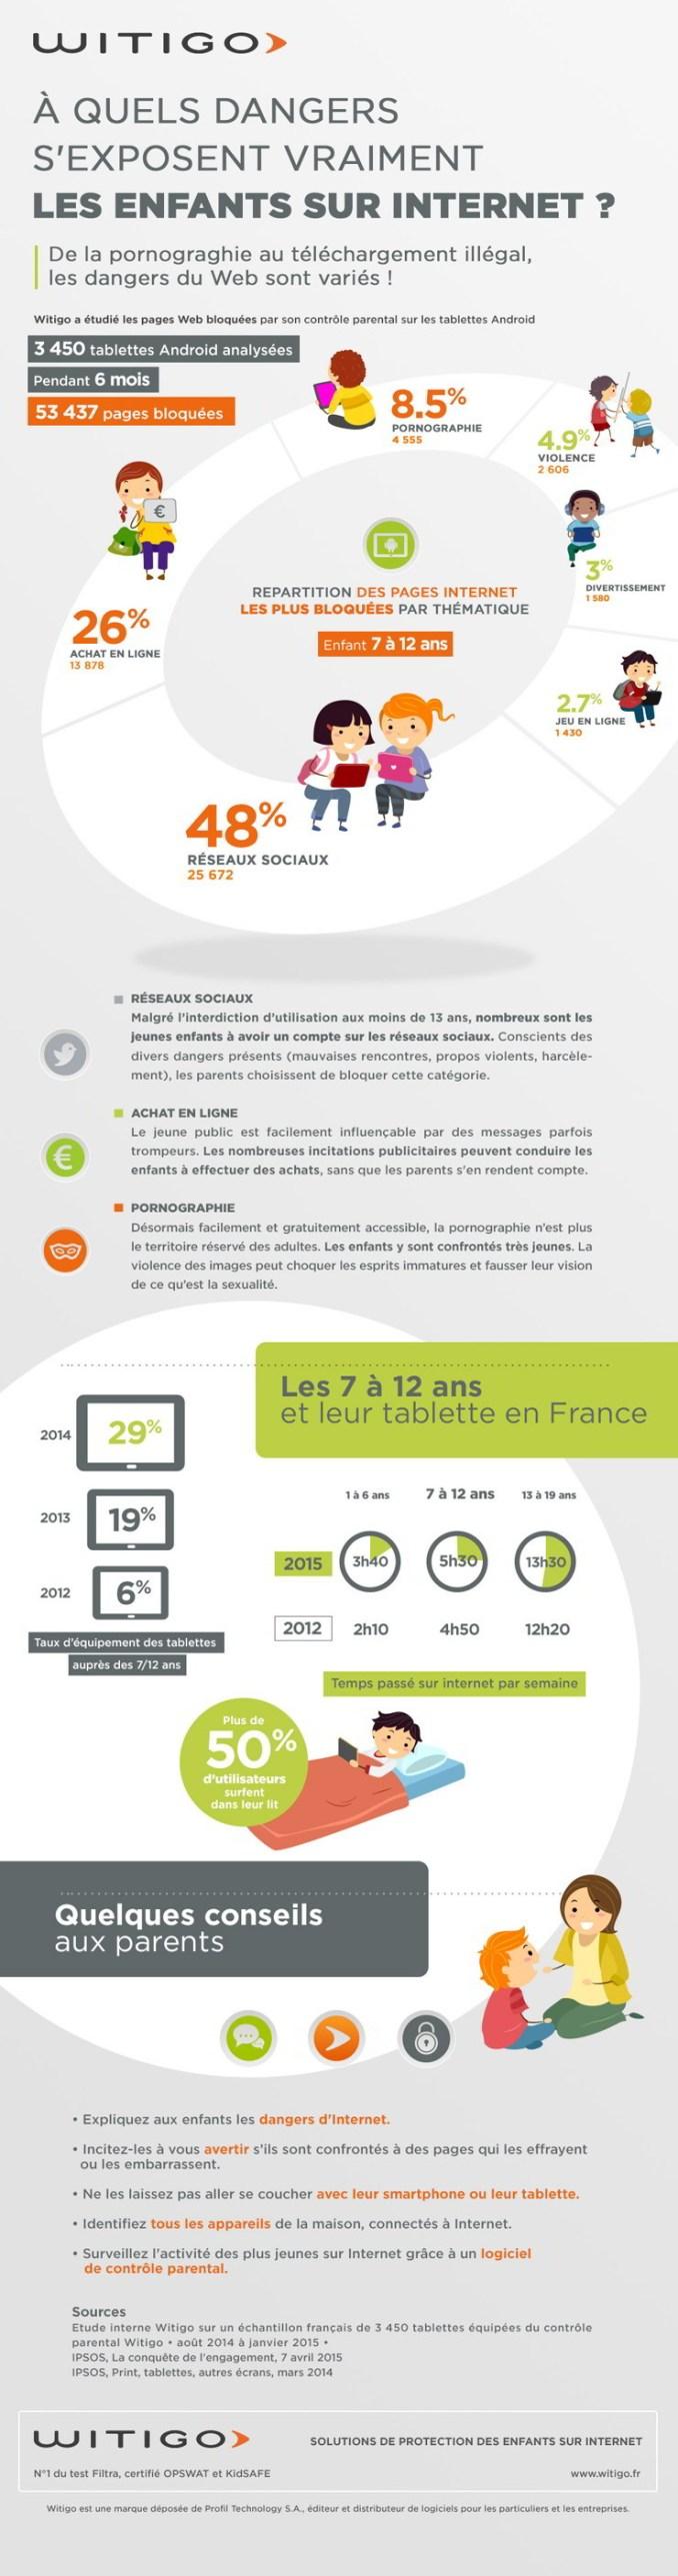 infographie-dangers-internet-enfants-witigo